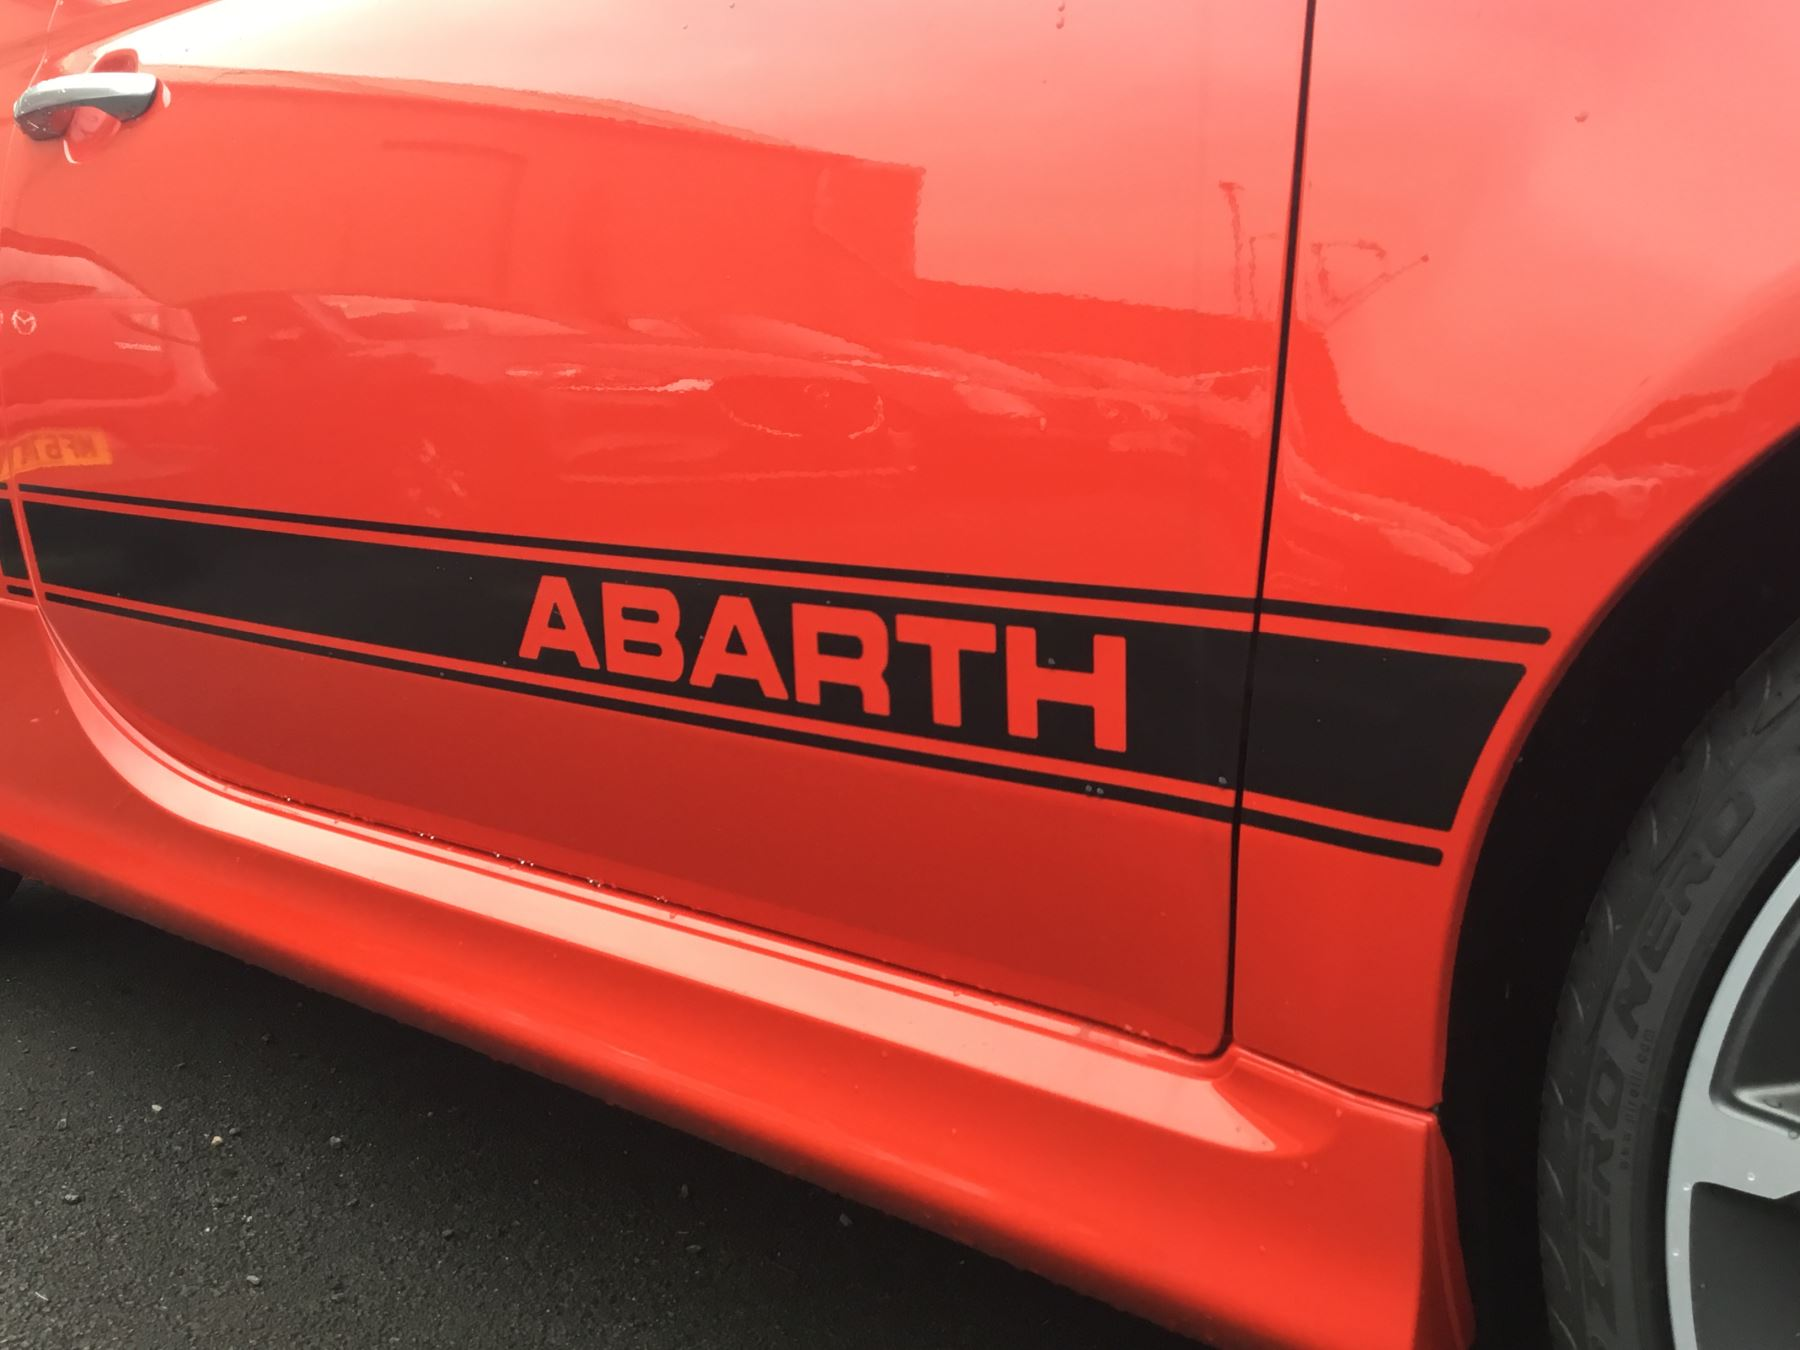 Abarth 595 1.4 T-Jet Turismo image 4